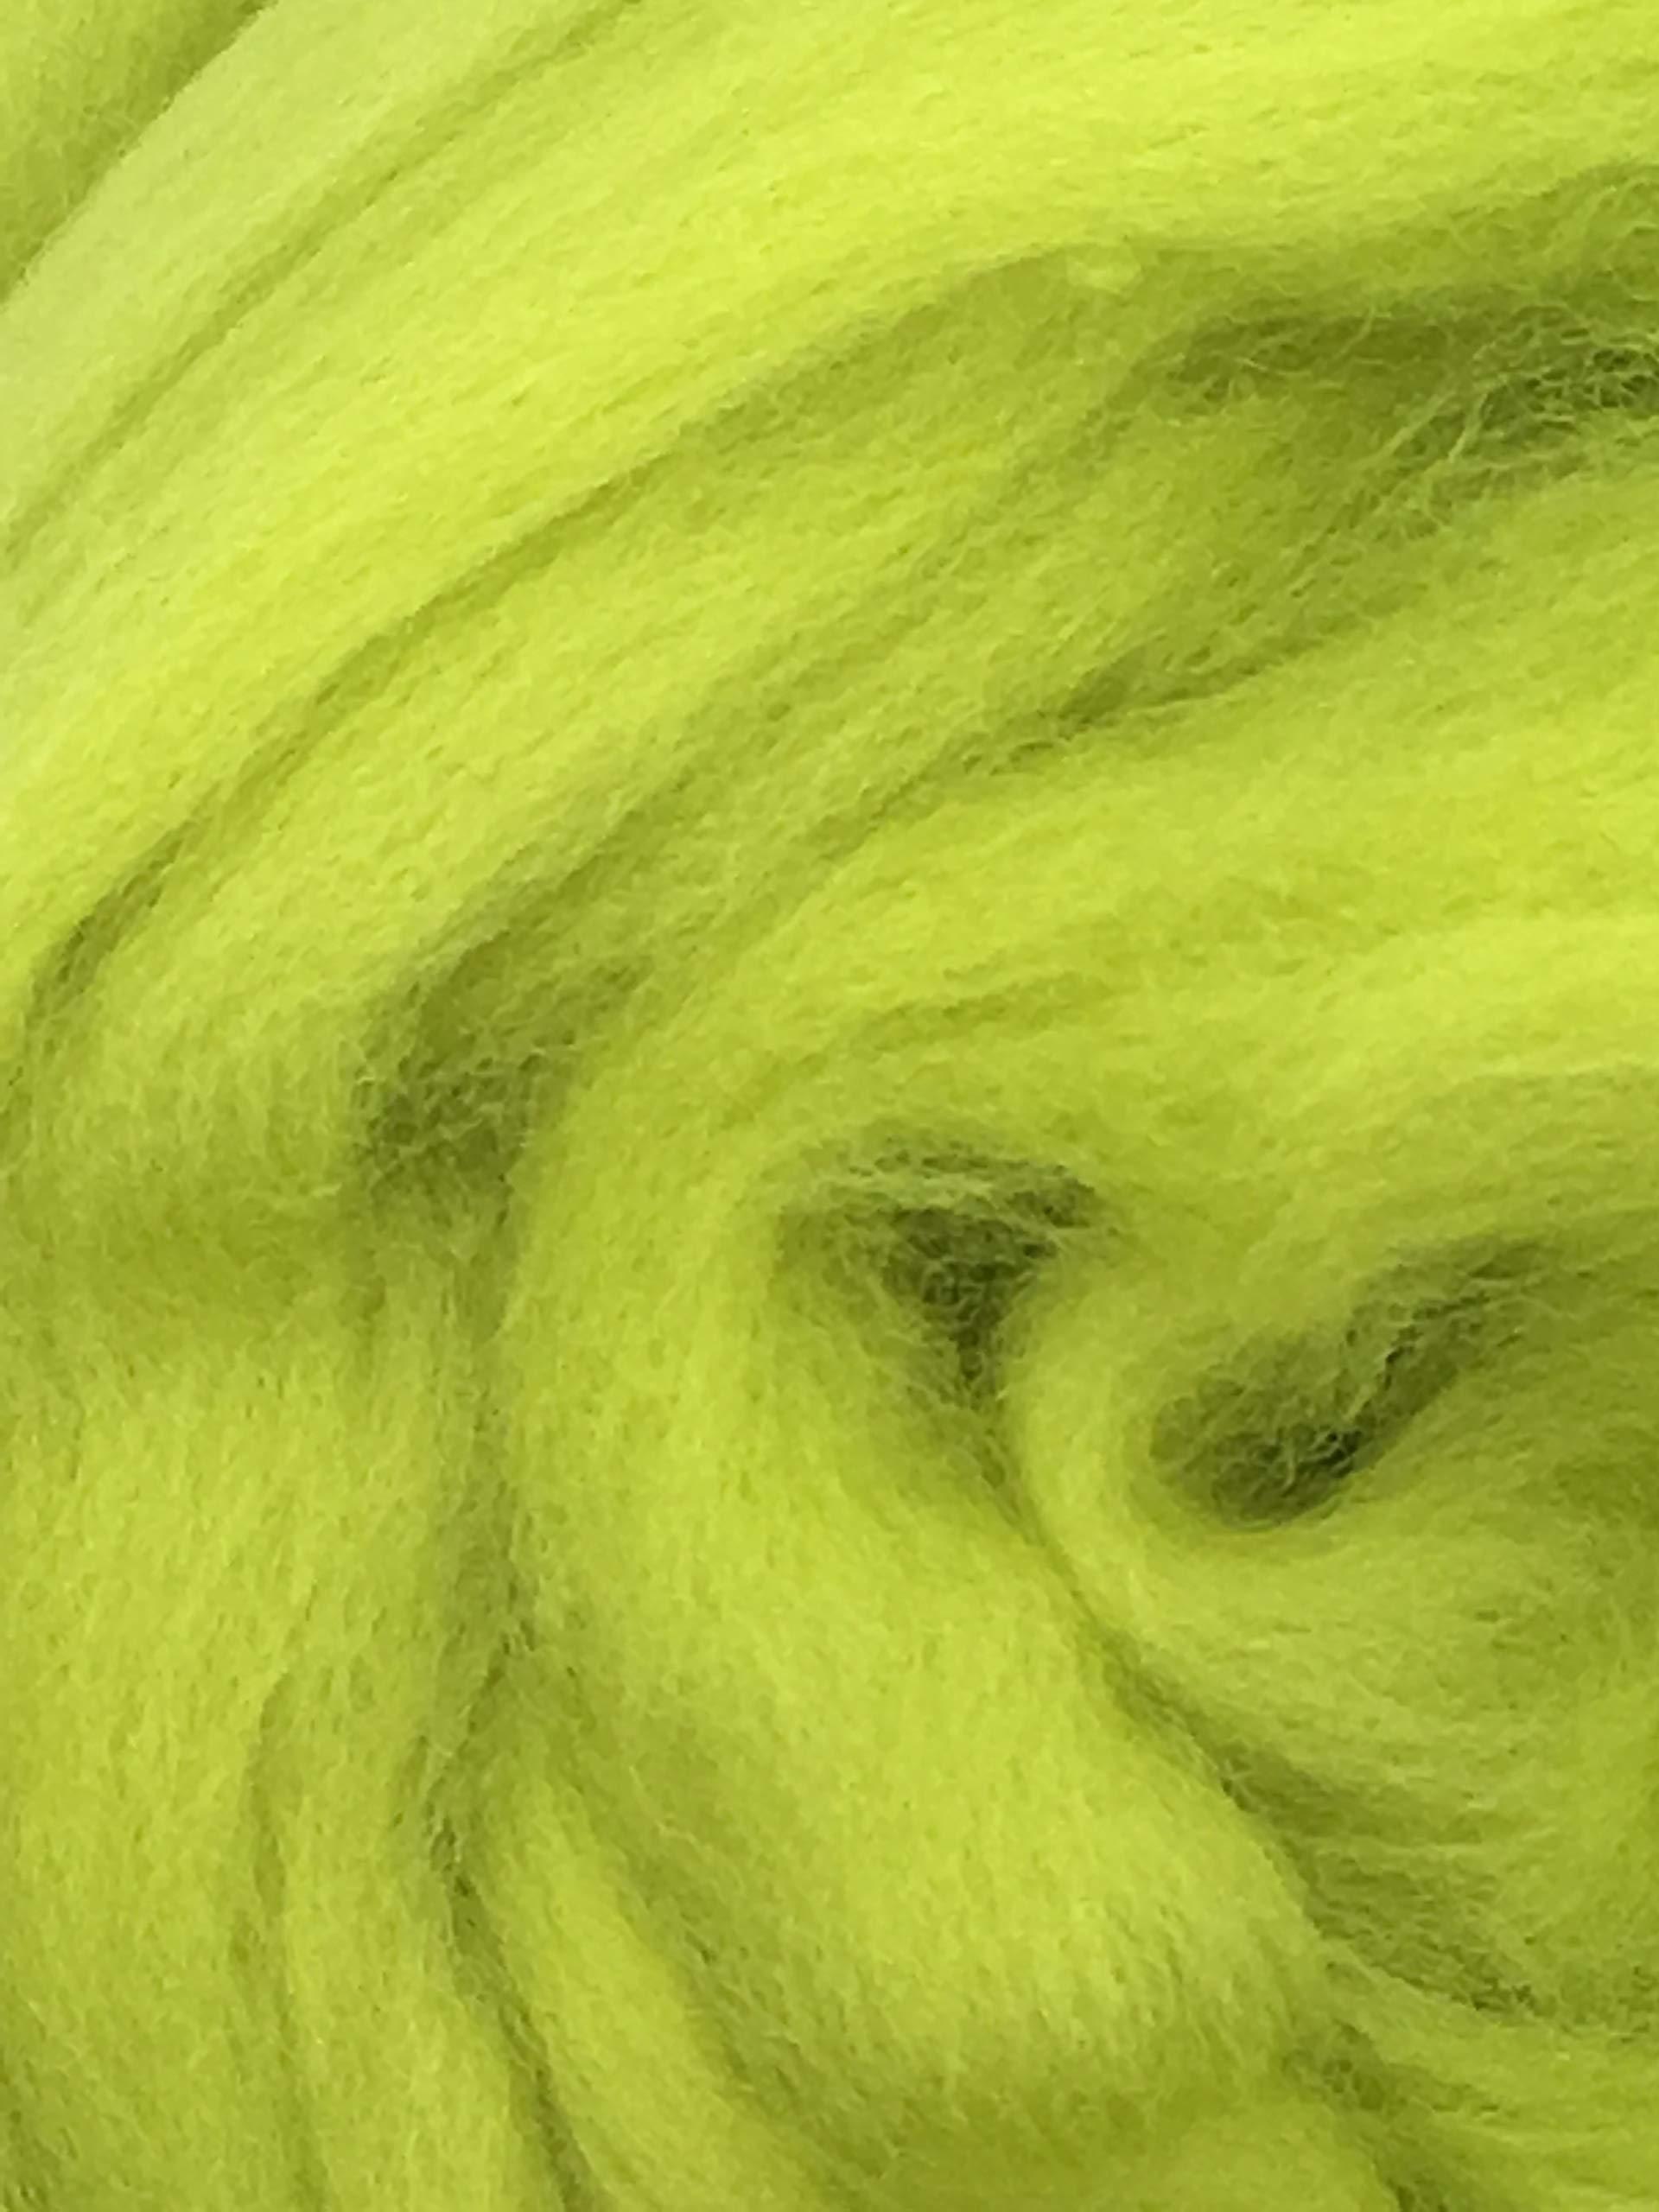 1lb Celedon Green Wool Top Roving - Spinning, Felting, Crafts USA by Shep's Wool (Image #1)